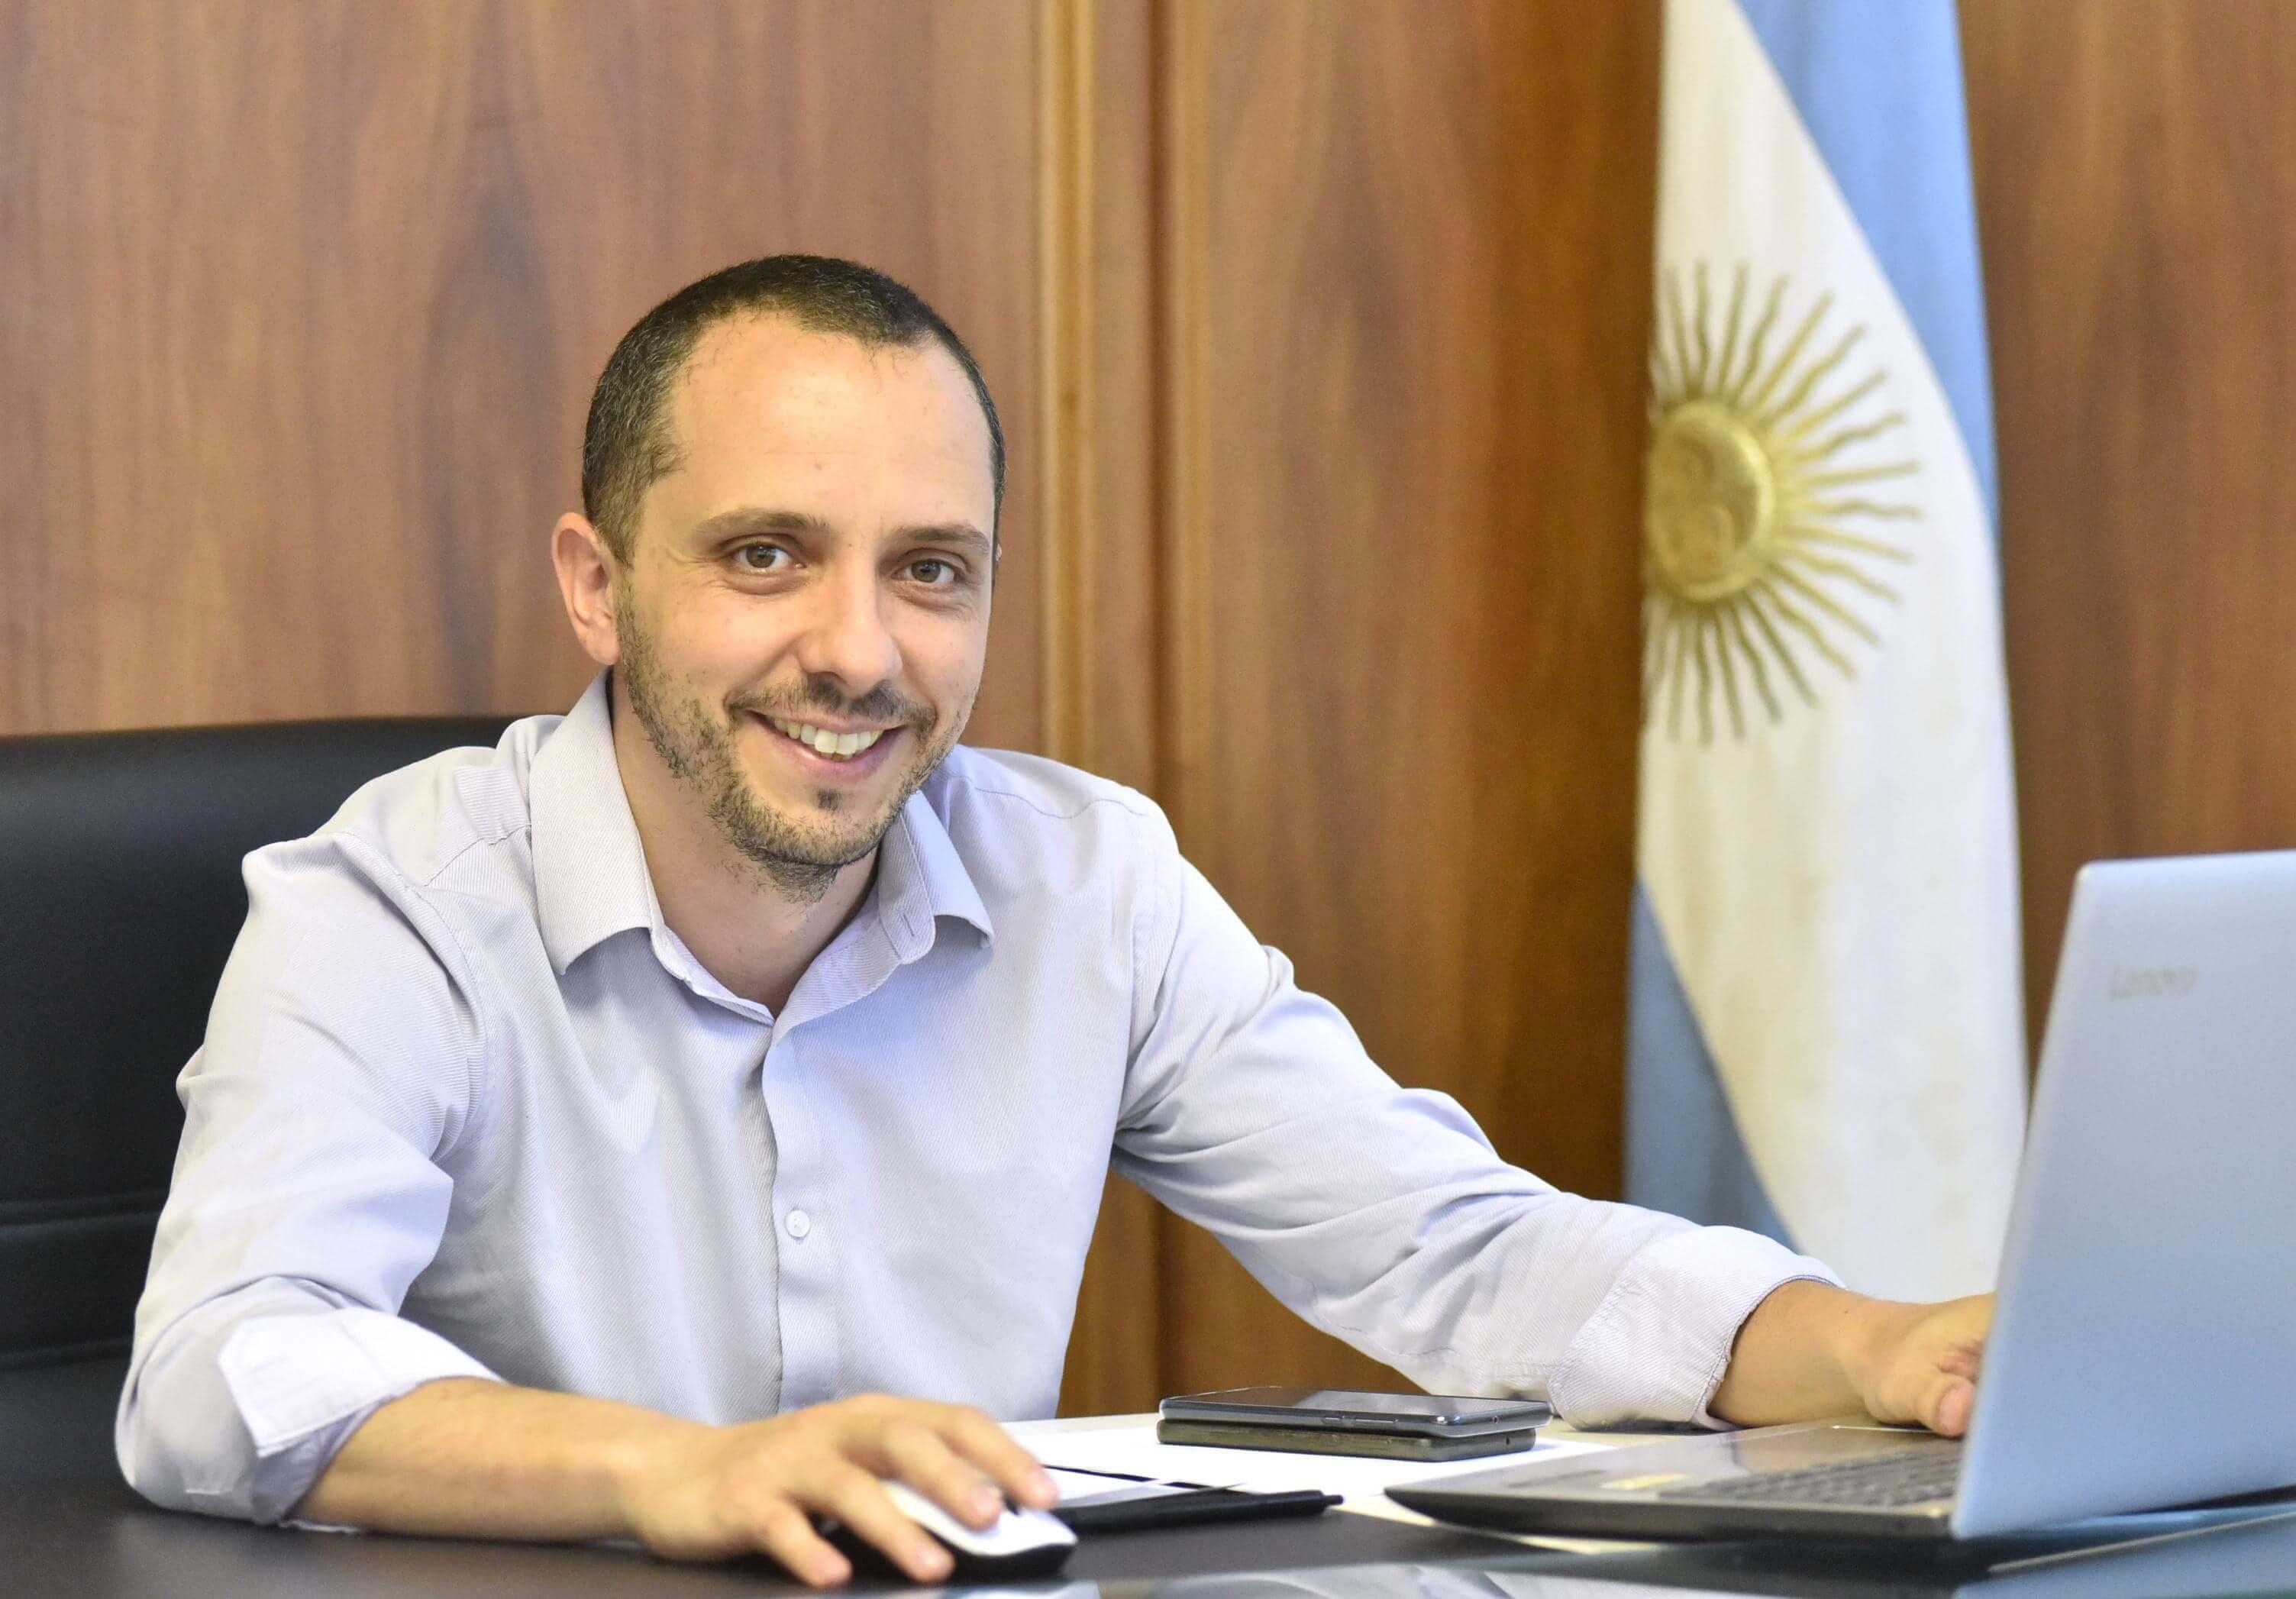 Ignacion Negroni